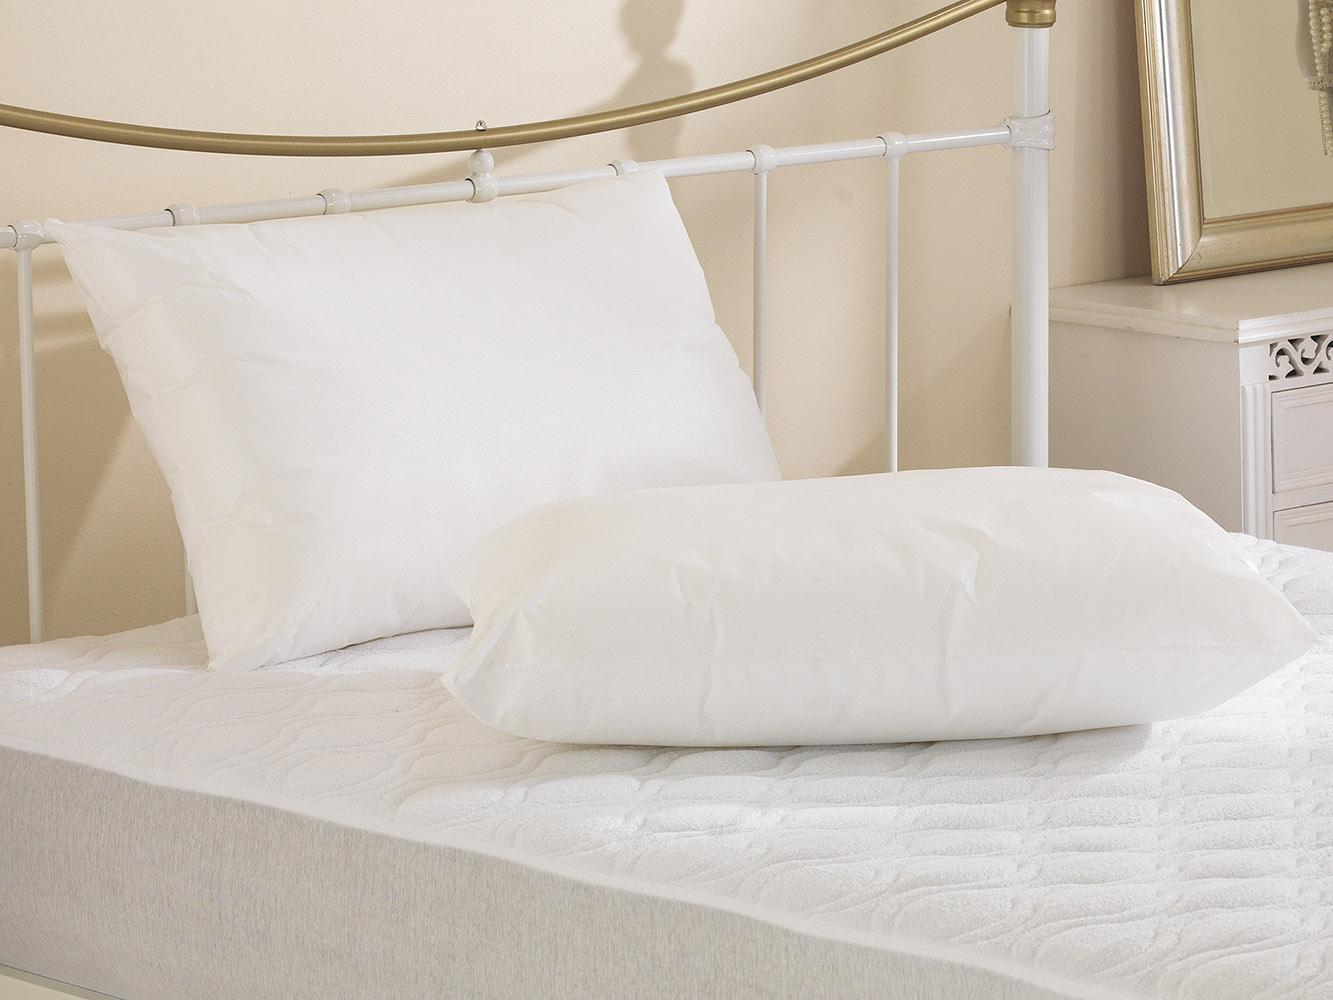 Hospital Medical Grade Waterproof Wipe Down Pillows